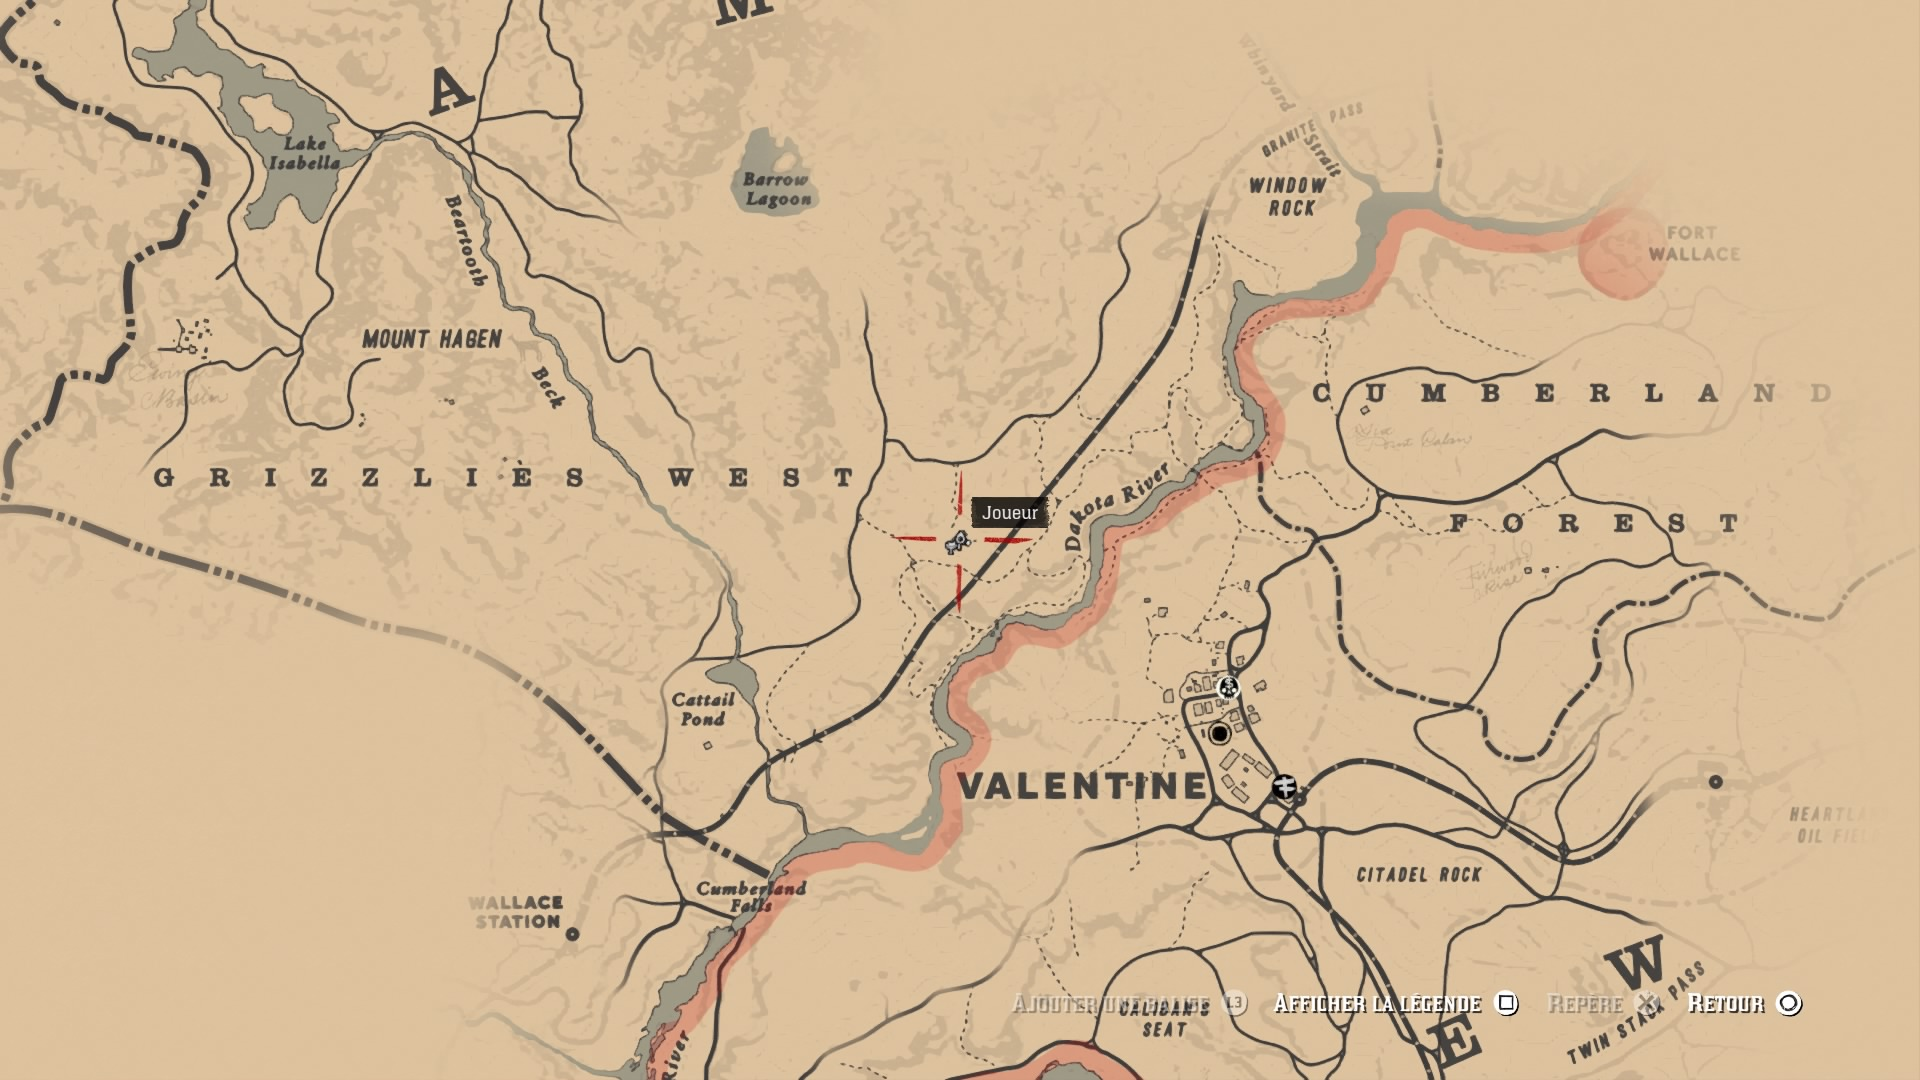 Carte Au Tresor Otis Miller.Soluce Red Dead Redemption 2 Les Objets Secrets Fr Game Actuality